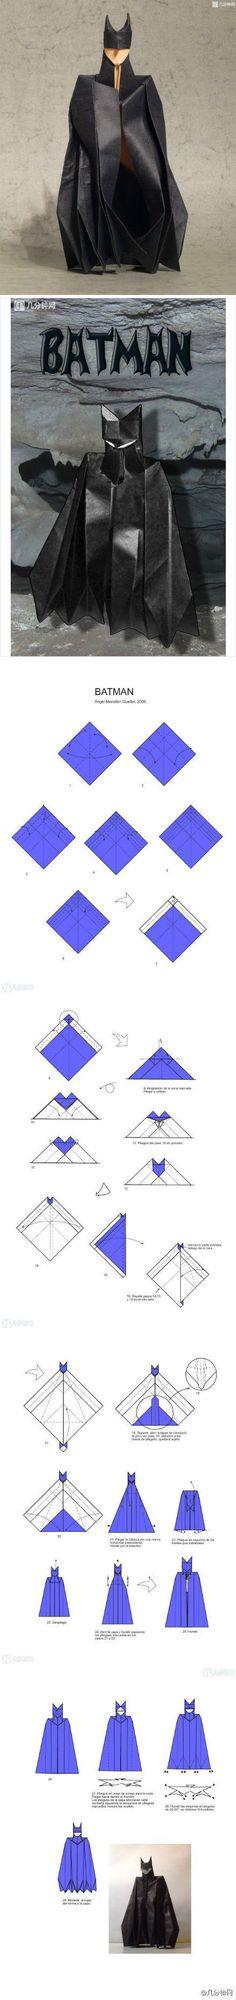 Origami Batman Folding Instructions / Origami Instruction